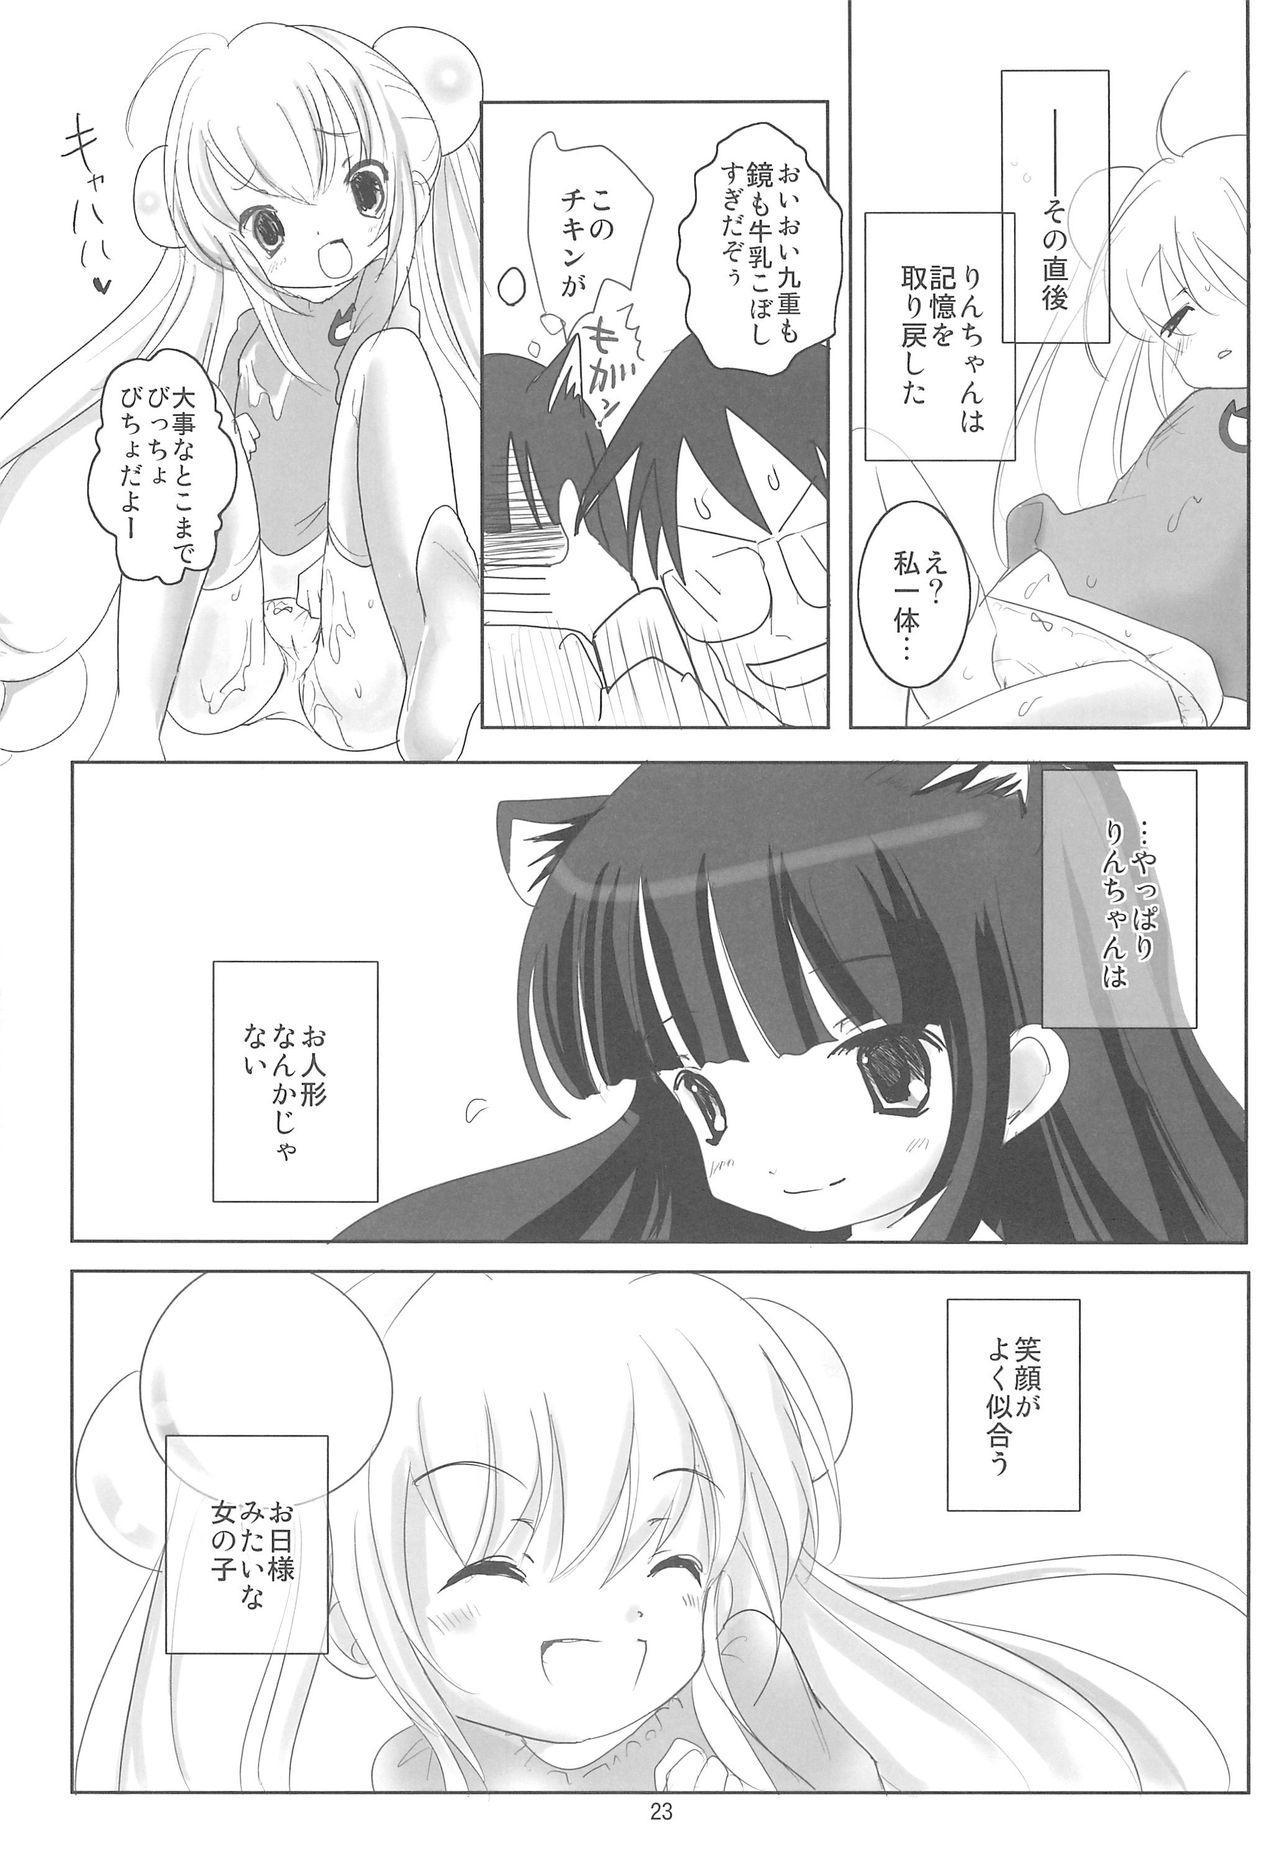 Crayon Rin-chan 21